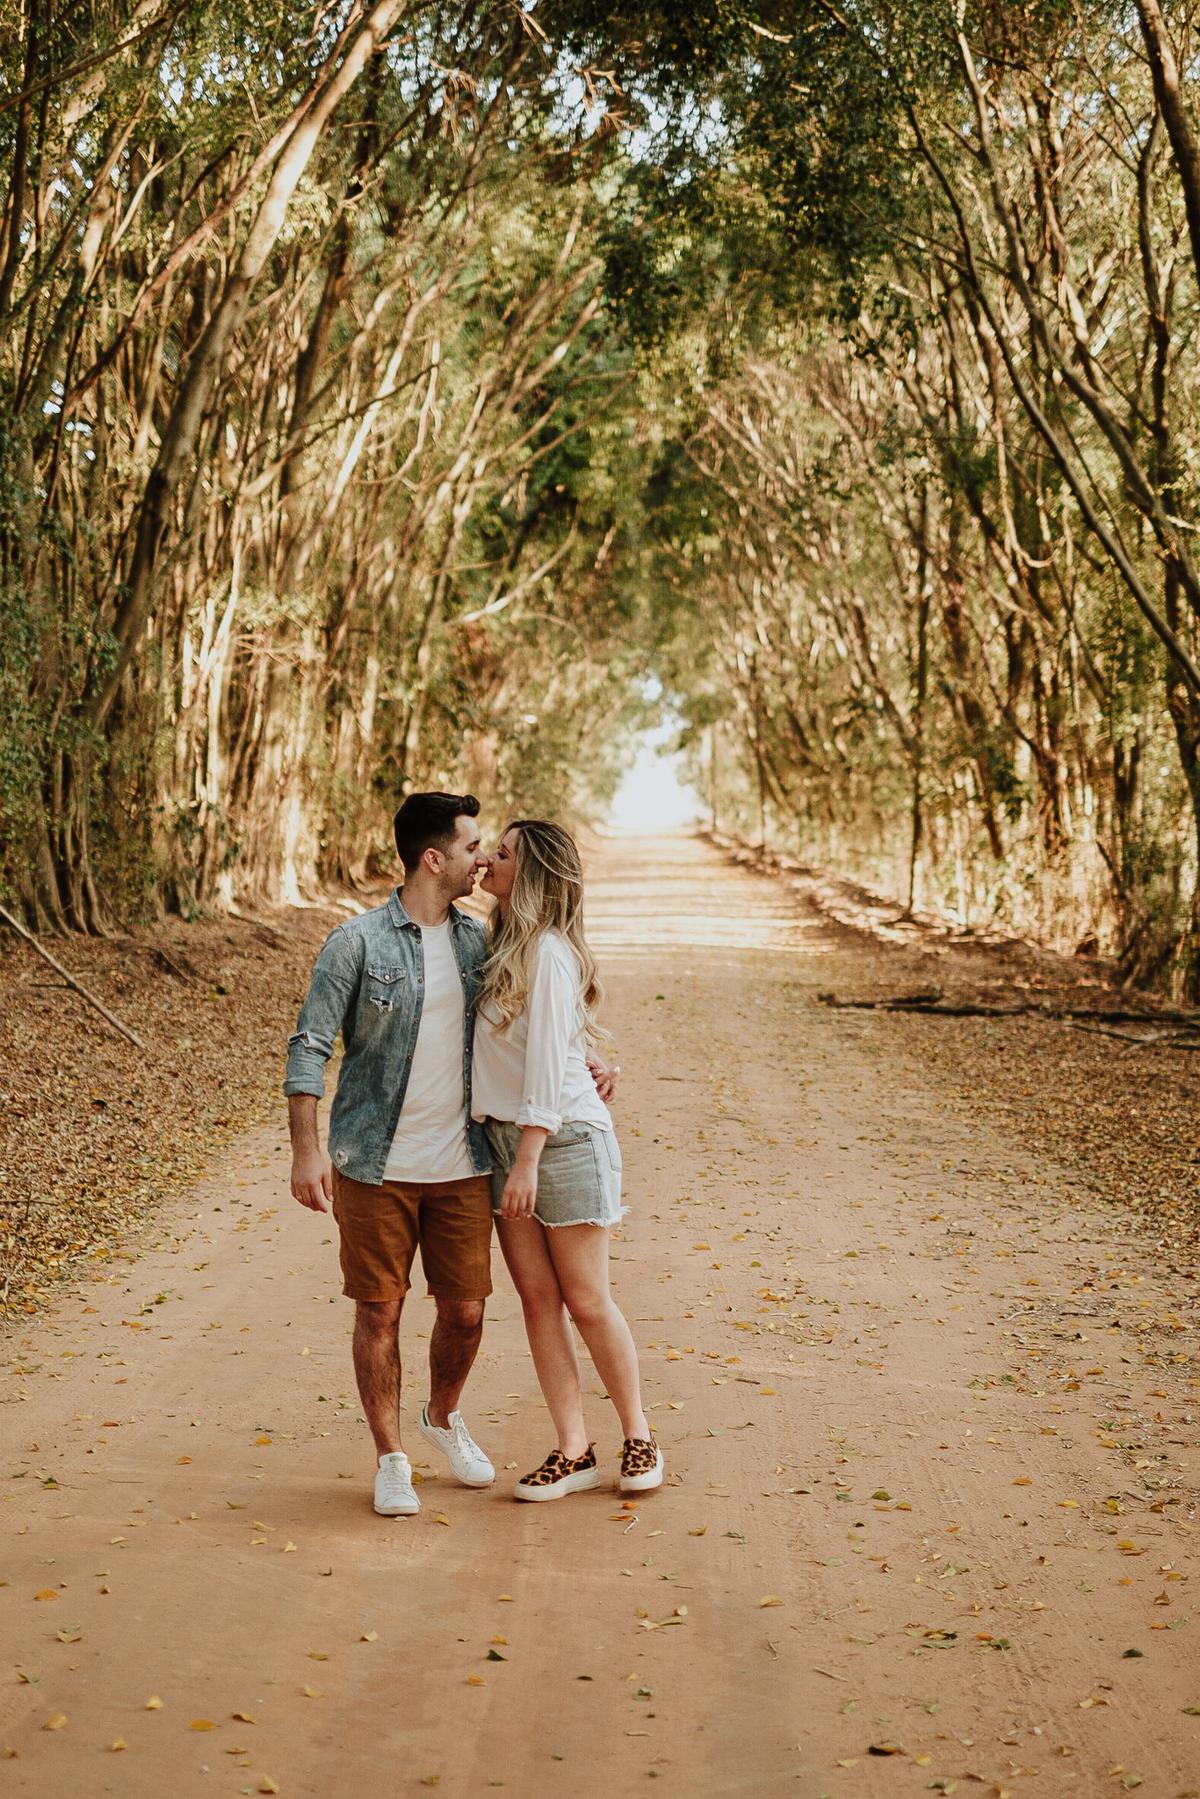 ensaio pre casamento no campo fotos por caio henrique fotografo de casamentos intimista holambra sao paulo capela